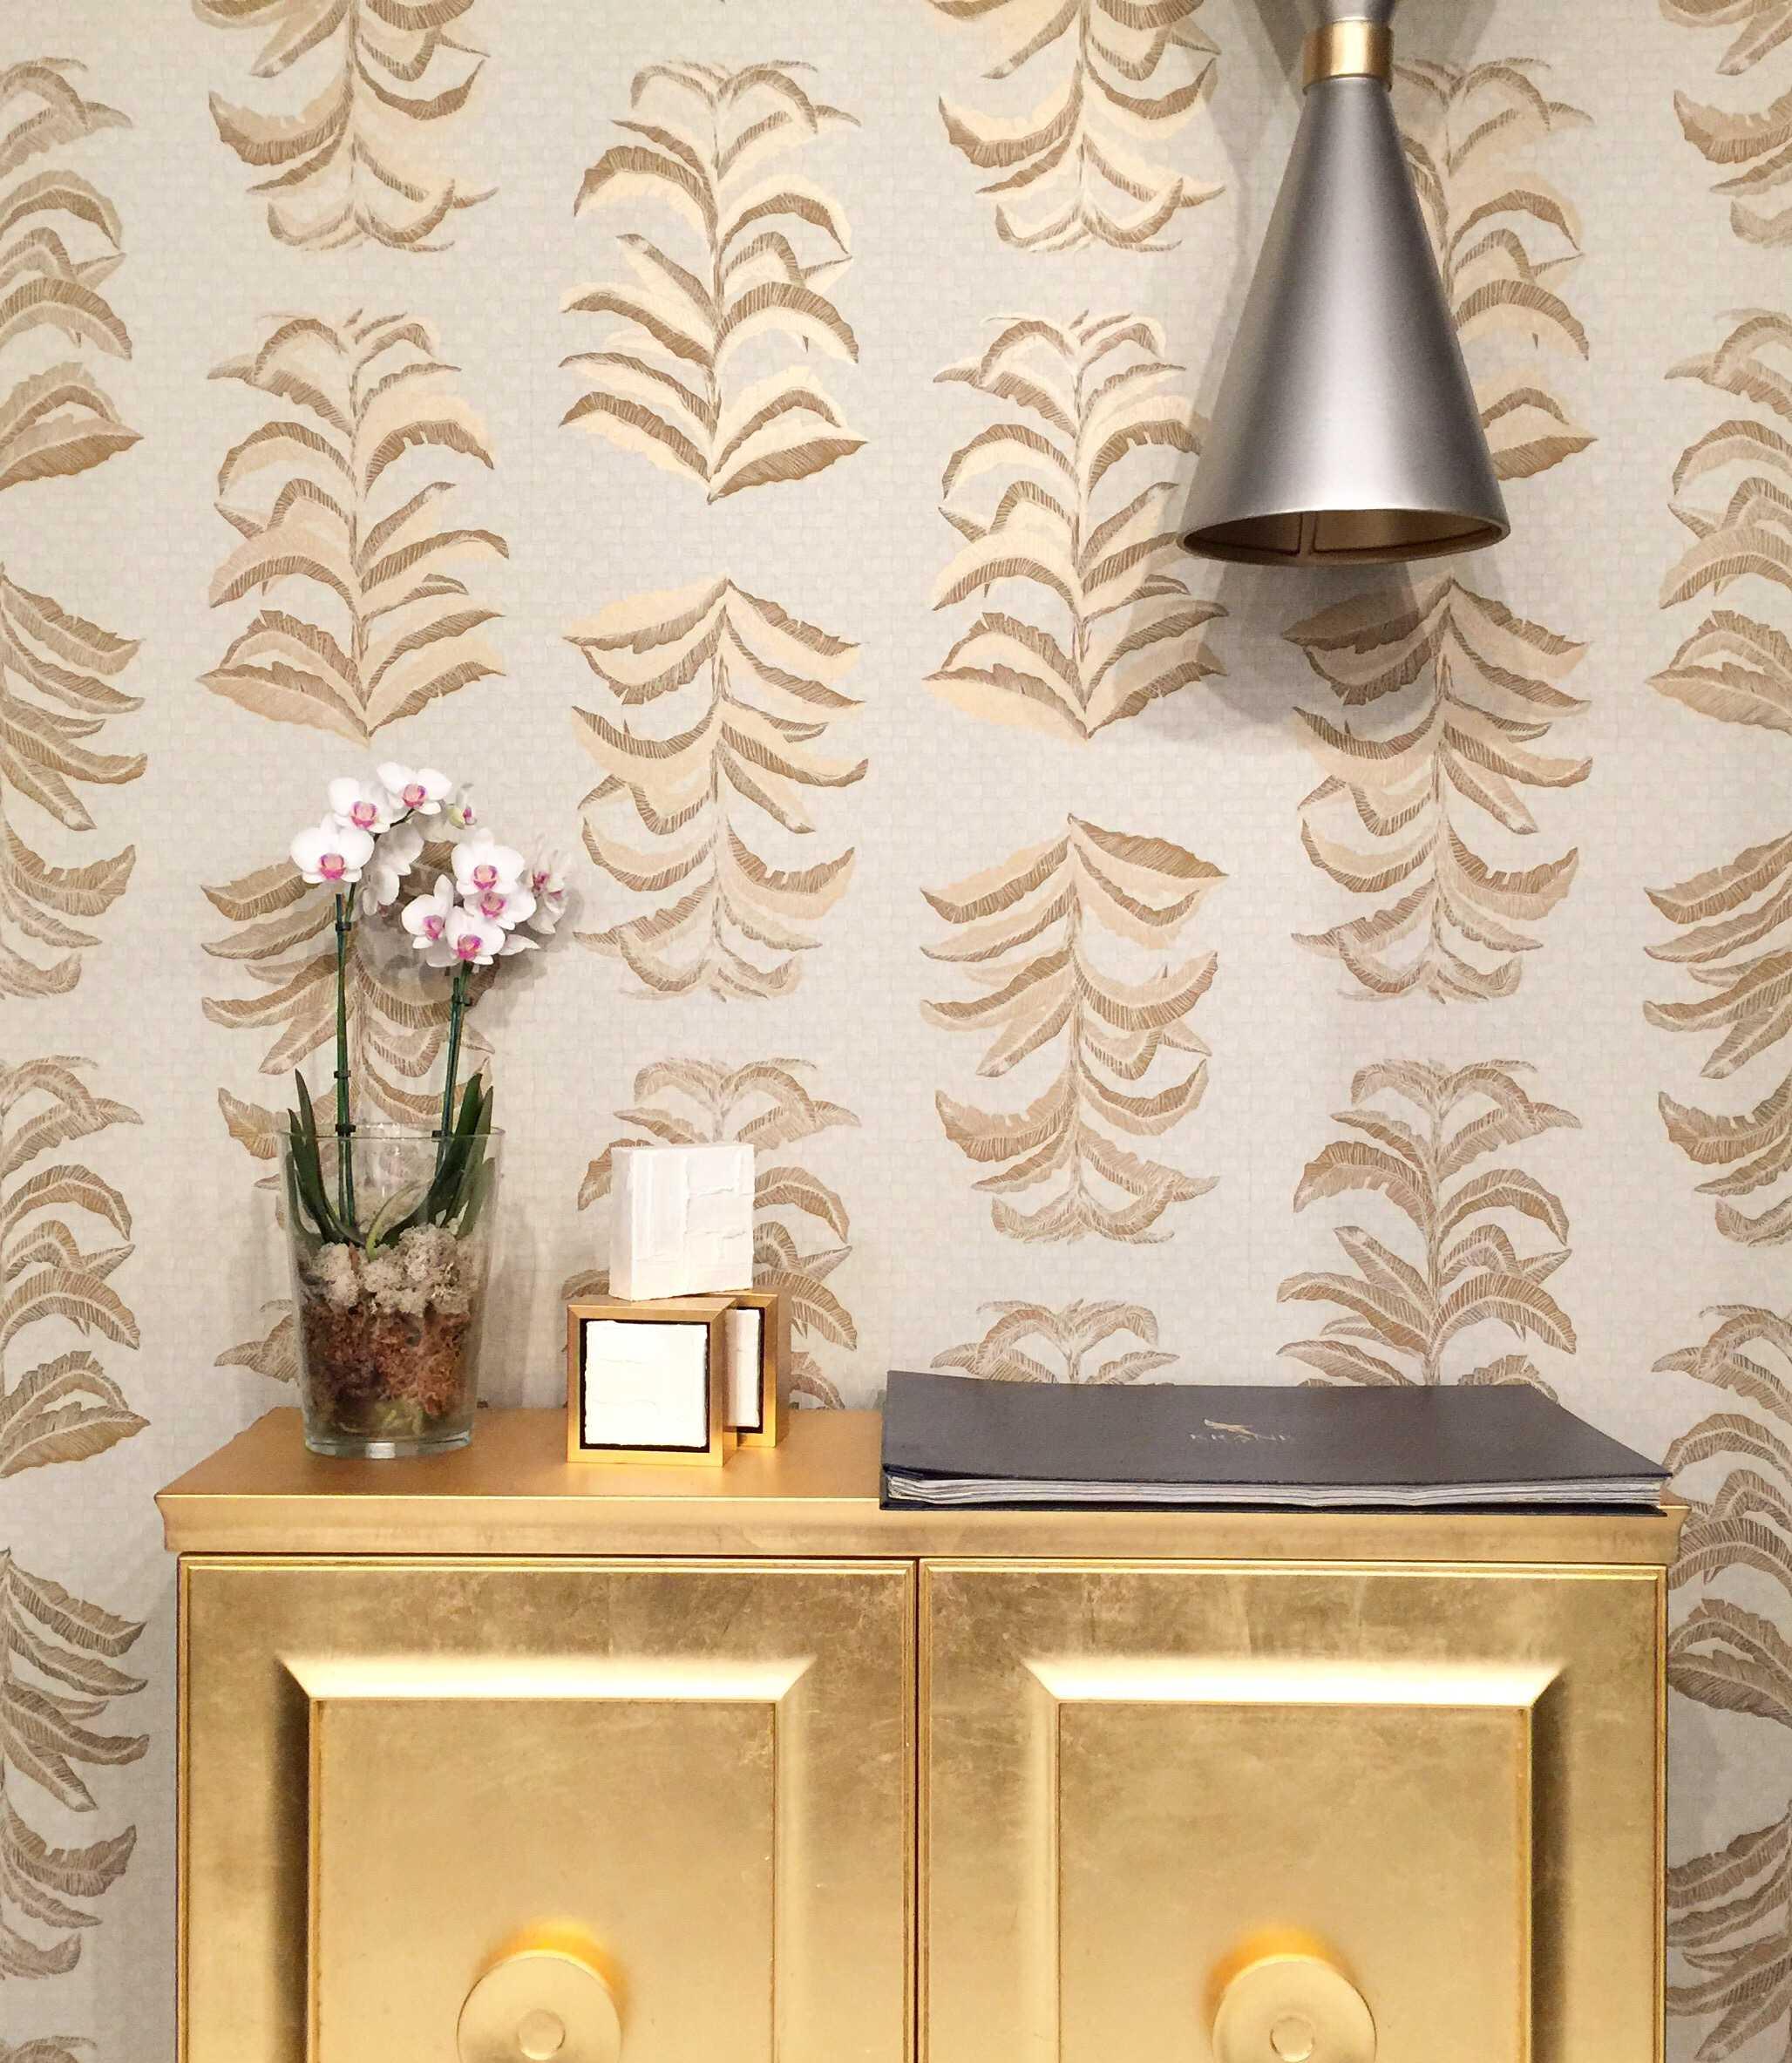 Banana Leaf Wallpaper in Gold